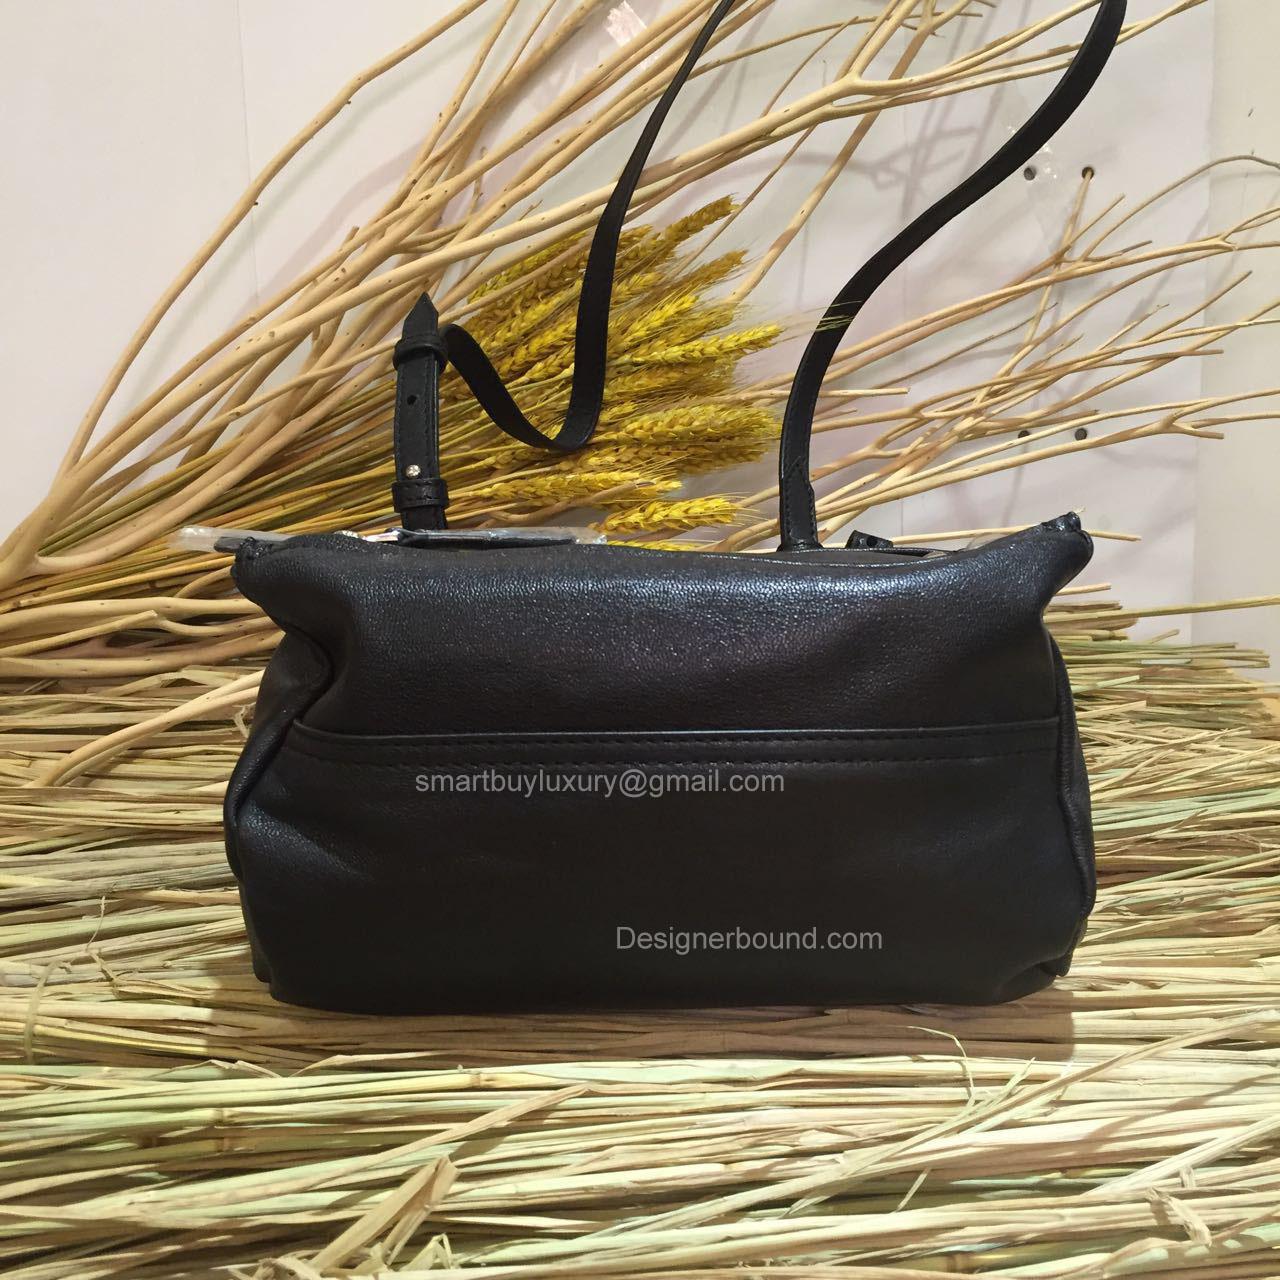 17b19ab1d5b1 ... Givenchy Pandora Mini Messenger Studed Bag Black 285172 ...